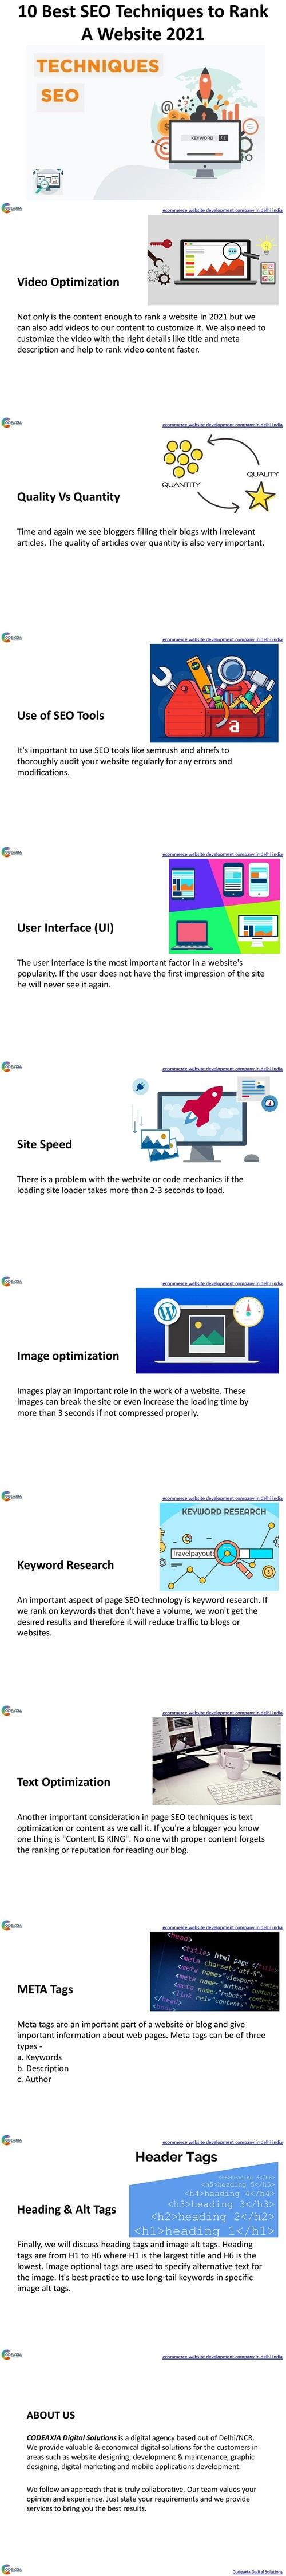 10 Best SEO Techniques to Rank a Website 2021 via Shalini Khurana